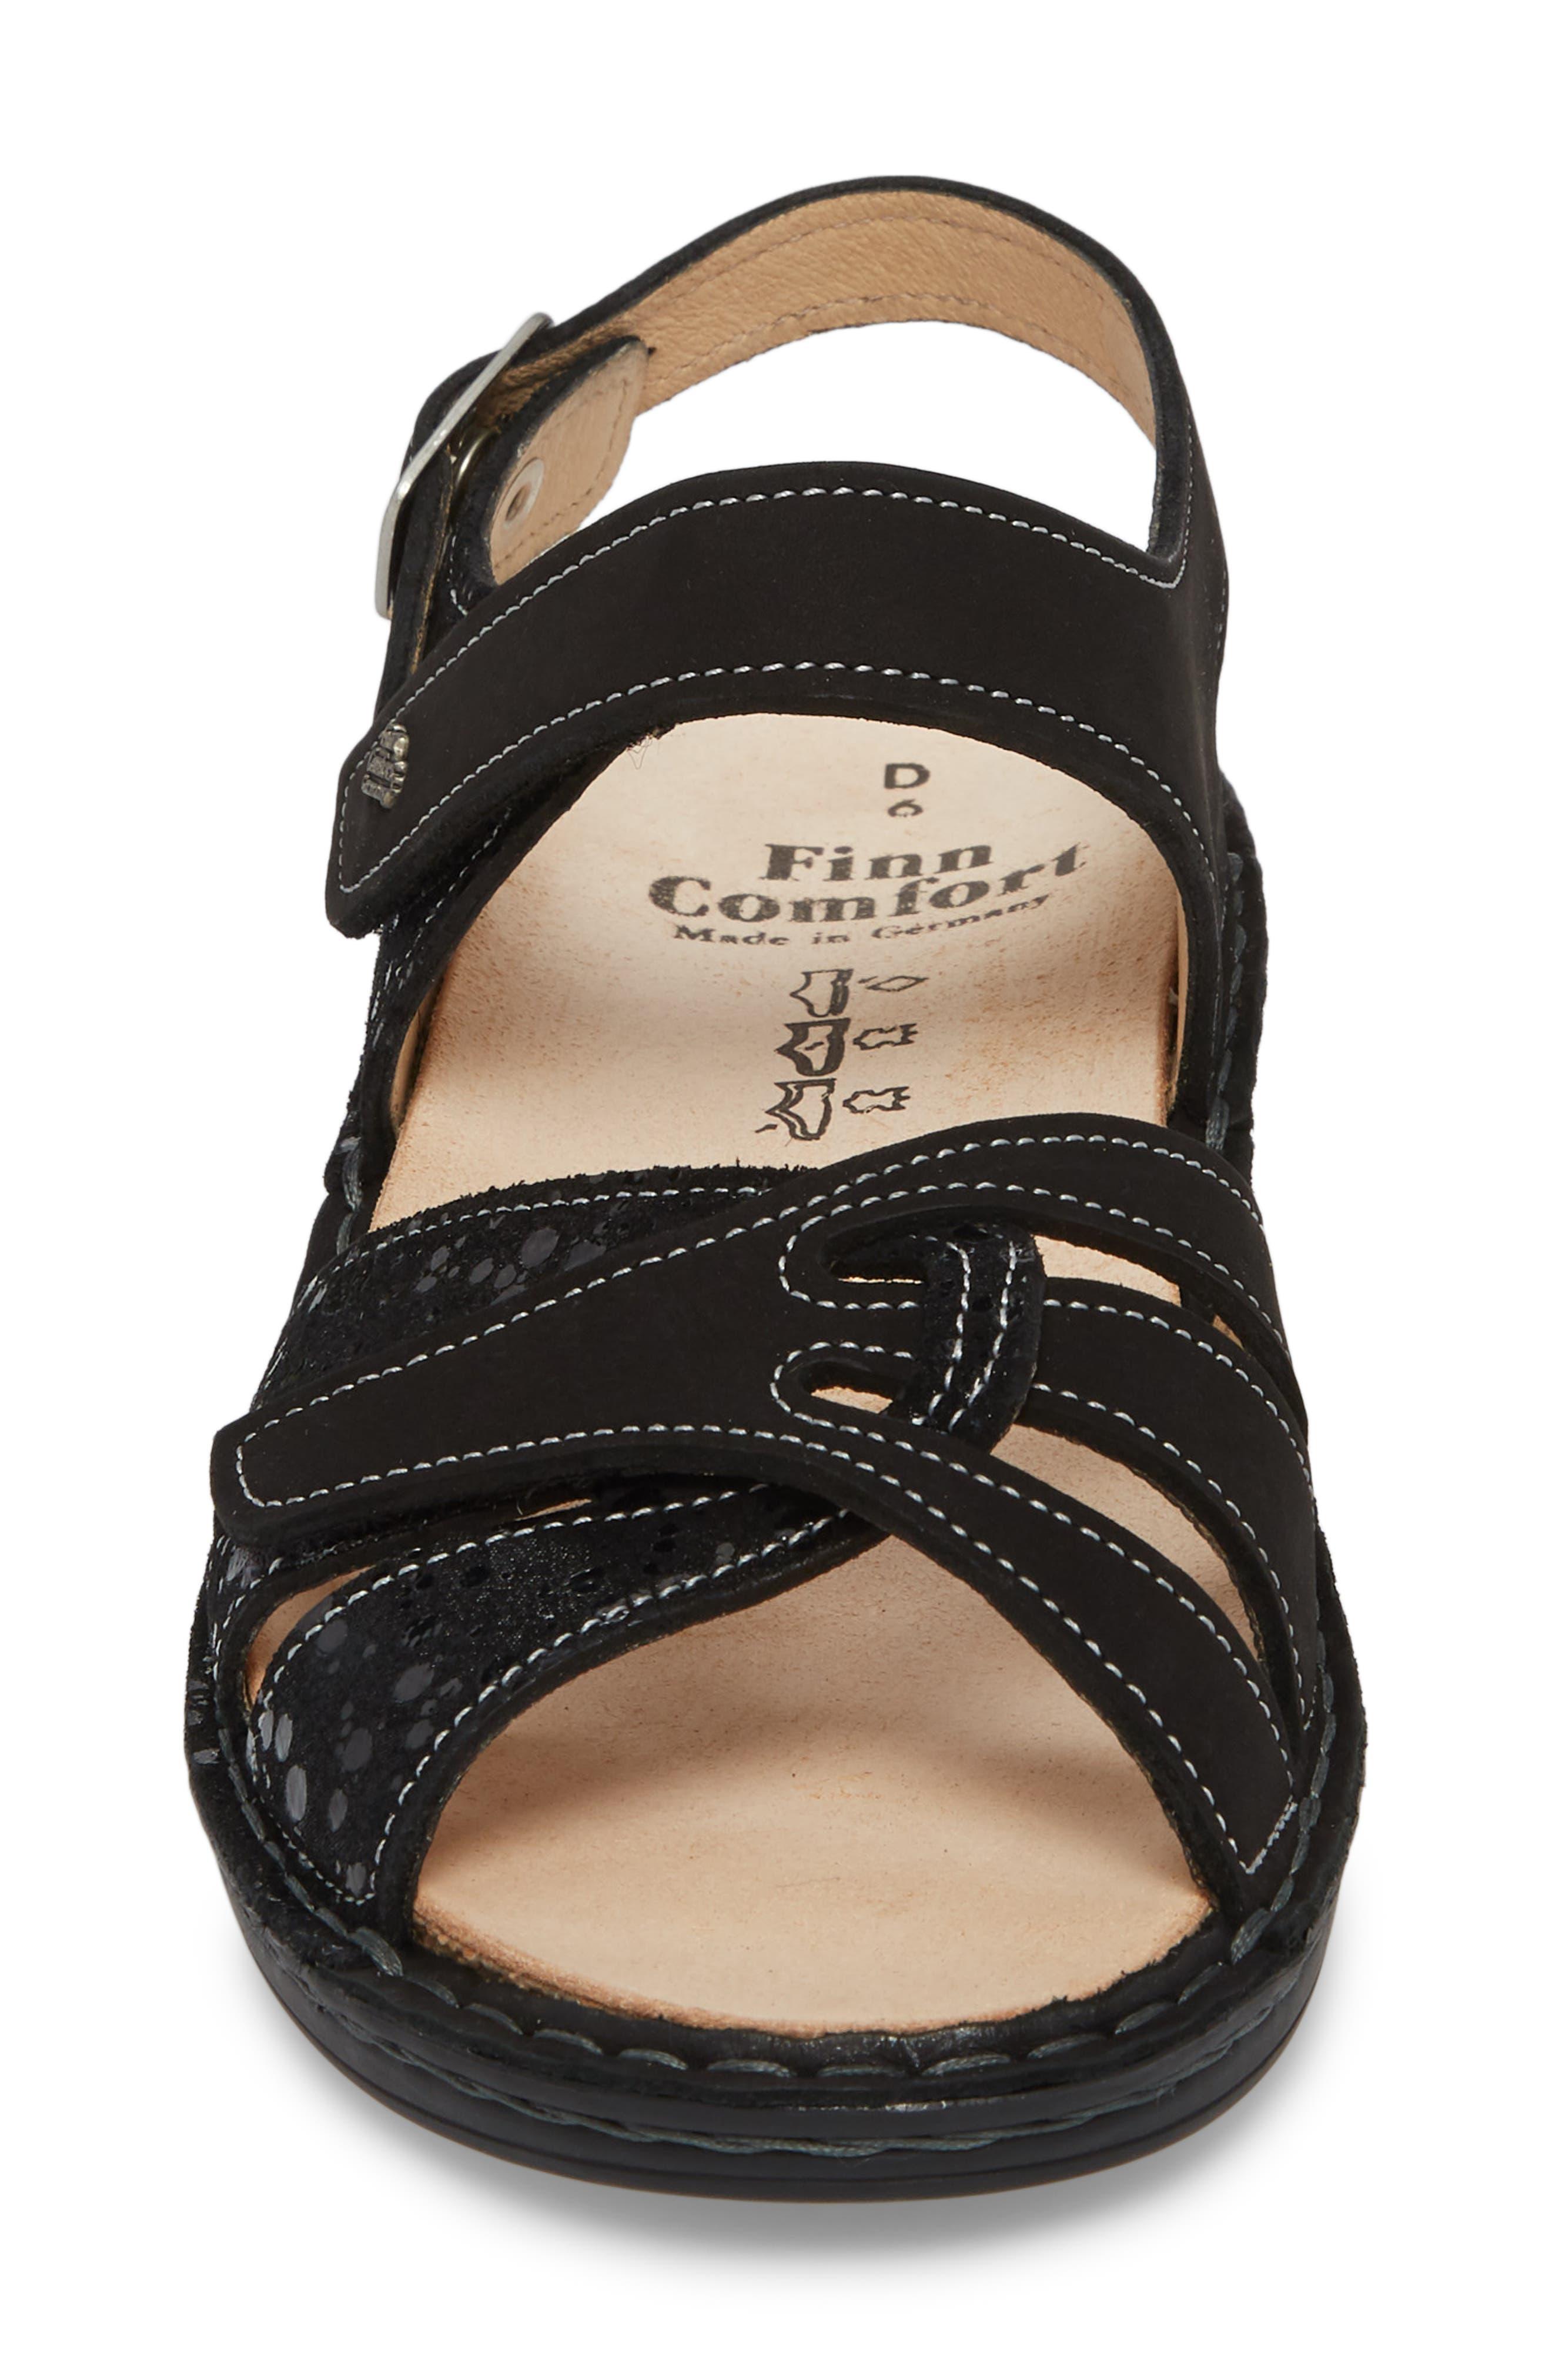 FINN COMFORT, Buka Sandal, Alternate thumbnail 4, color, 001